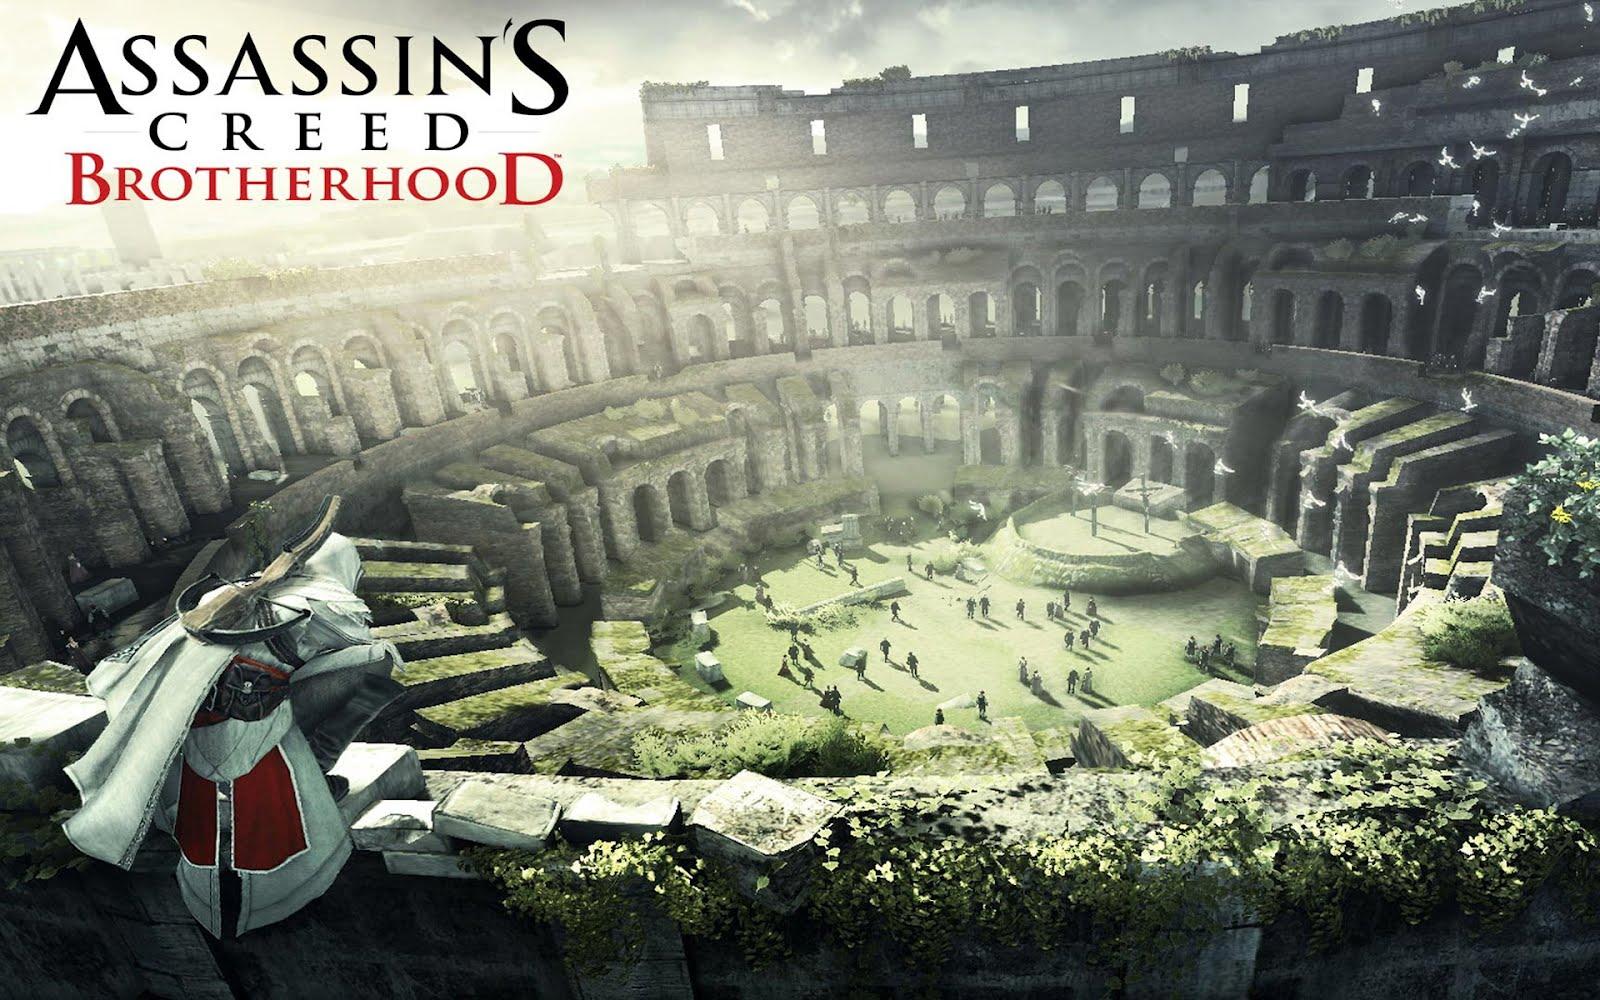 Beautiful   Wallpaper Horse Assassin'S Creed - Best%2BHD%2BGames%2BWallpapers  Snapshot_238291.jpg